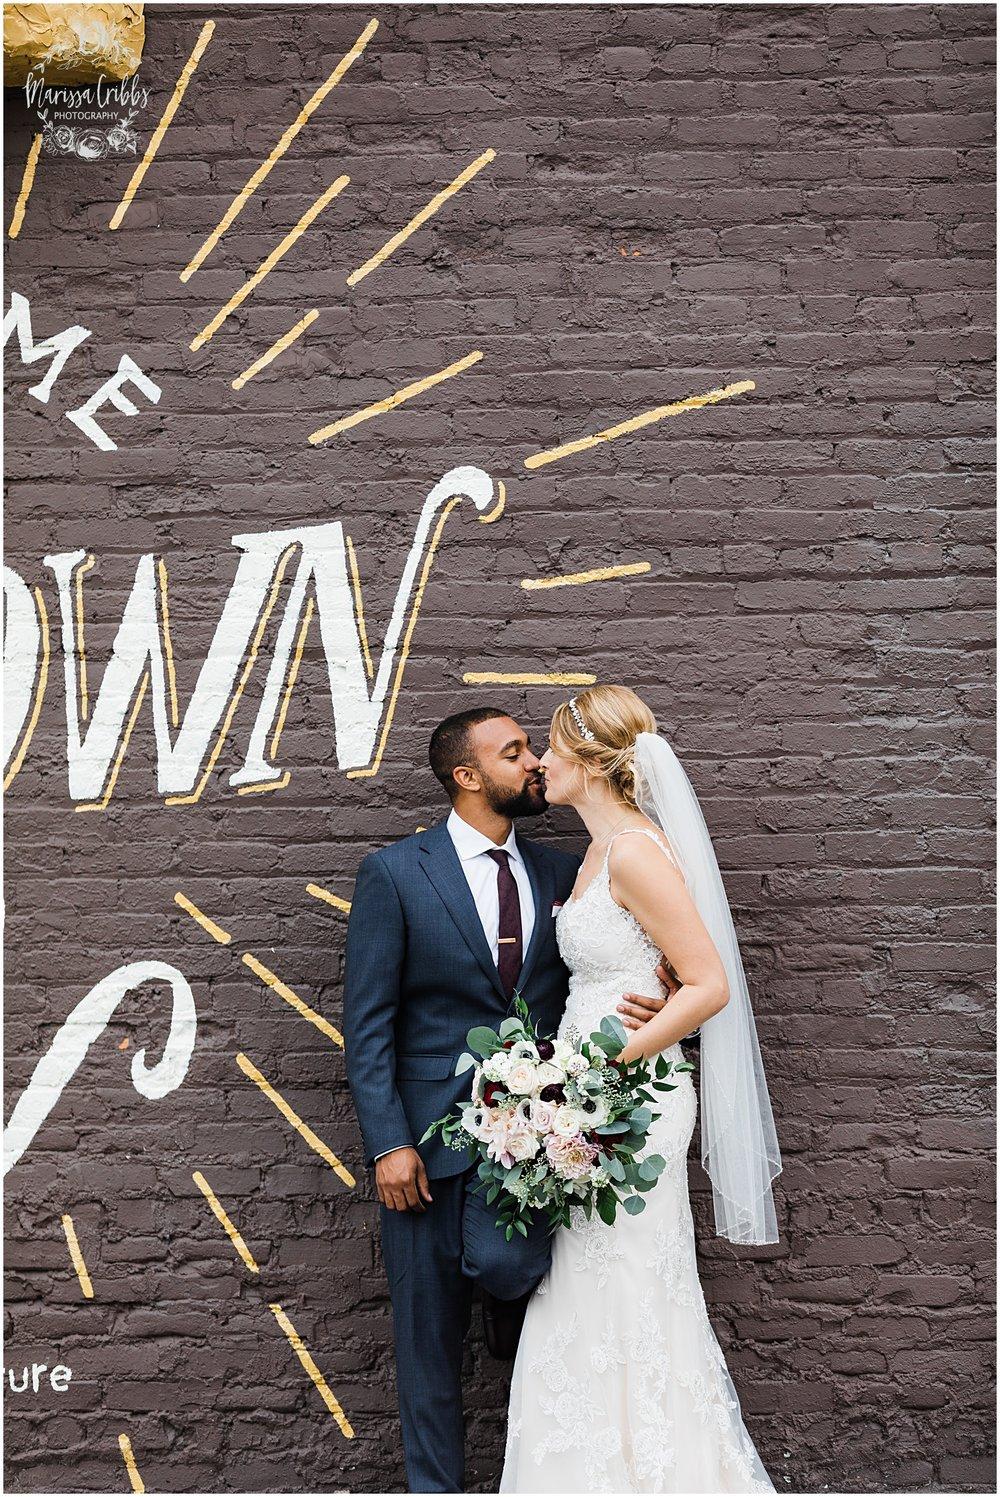 BAUER WEDDING | KELSEA & JUSTIN | MARISSA CRIBBS PHOTOGRAPHY_6539.jpg